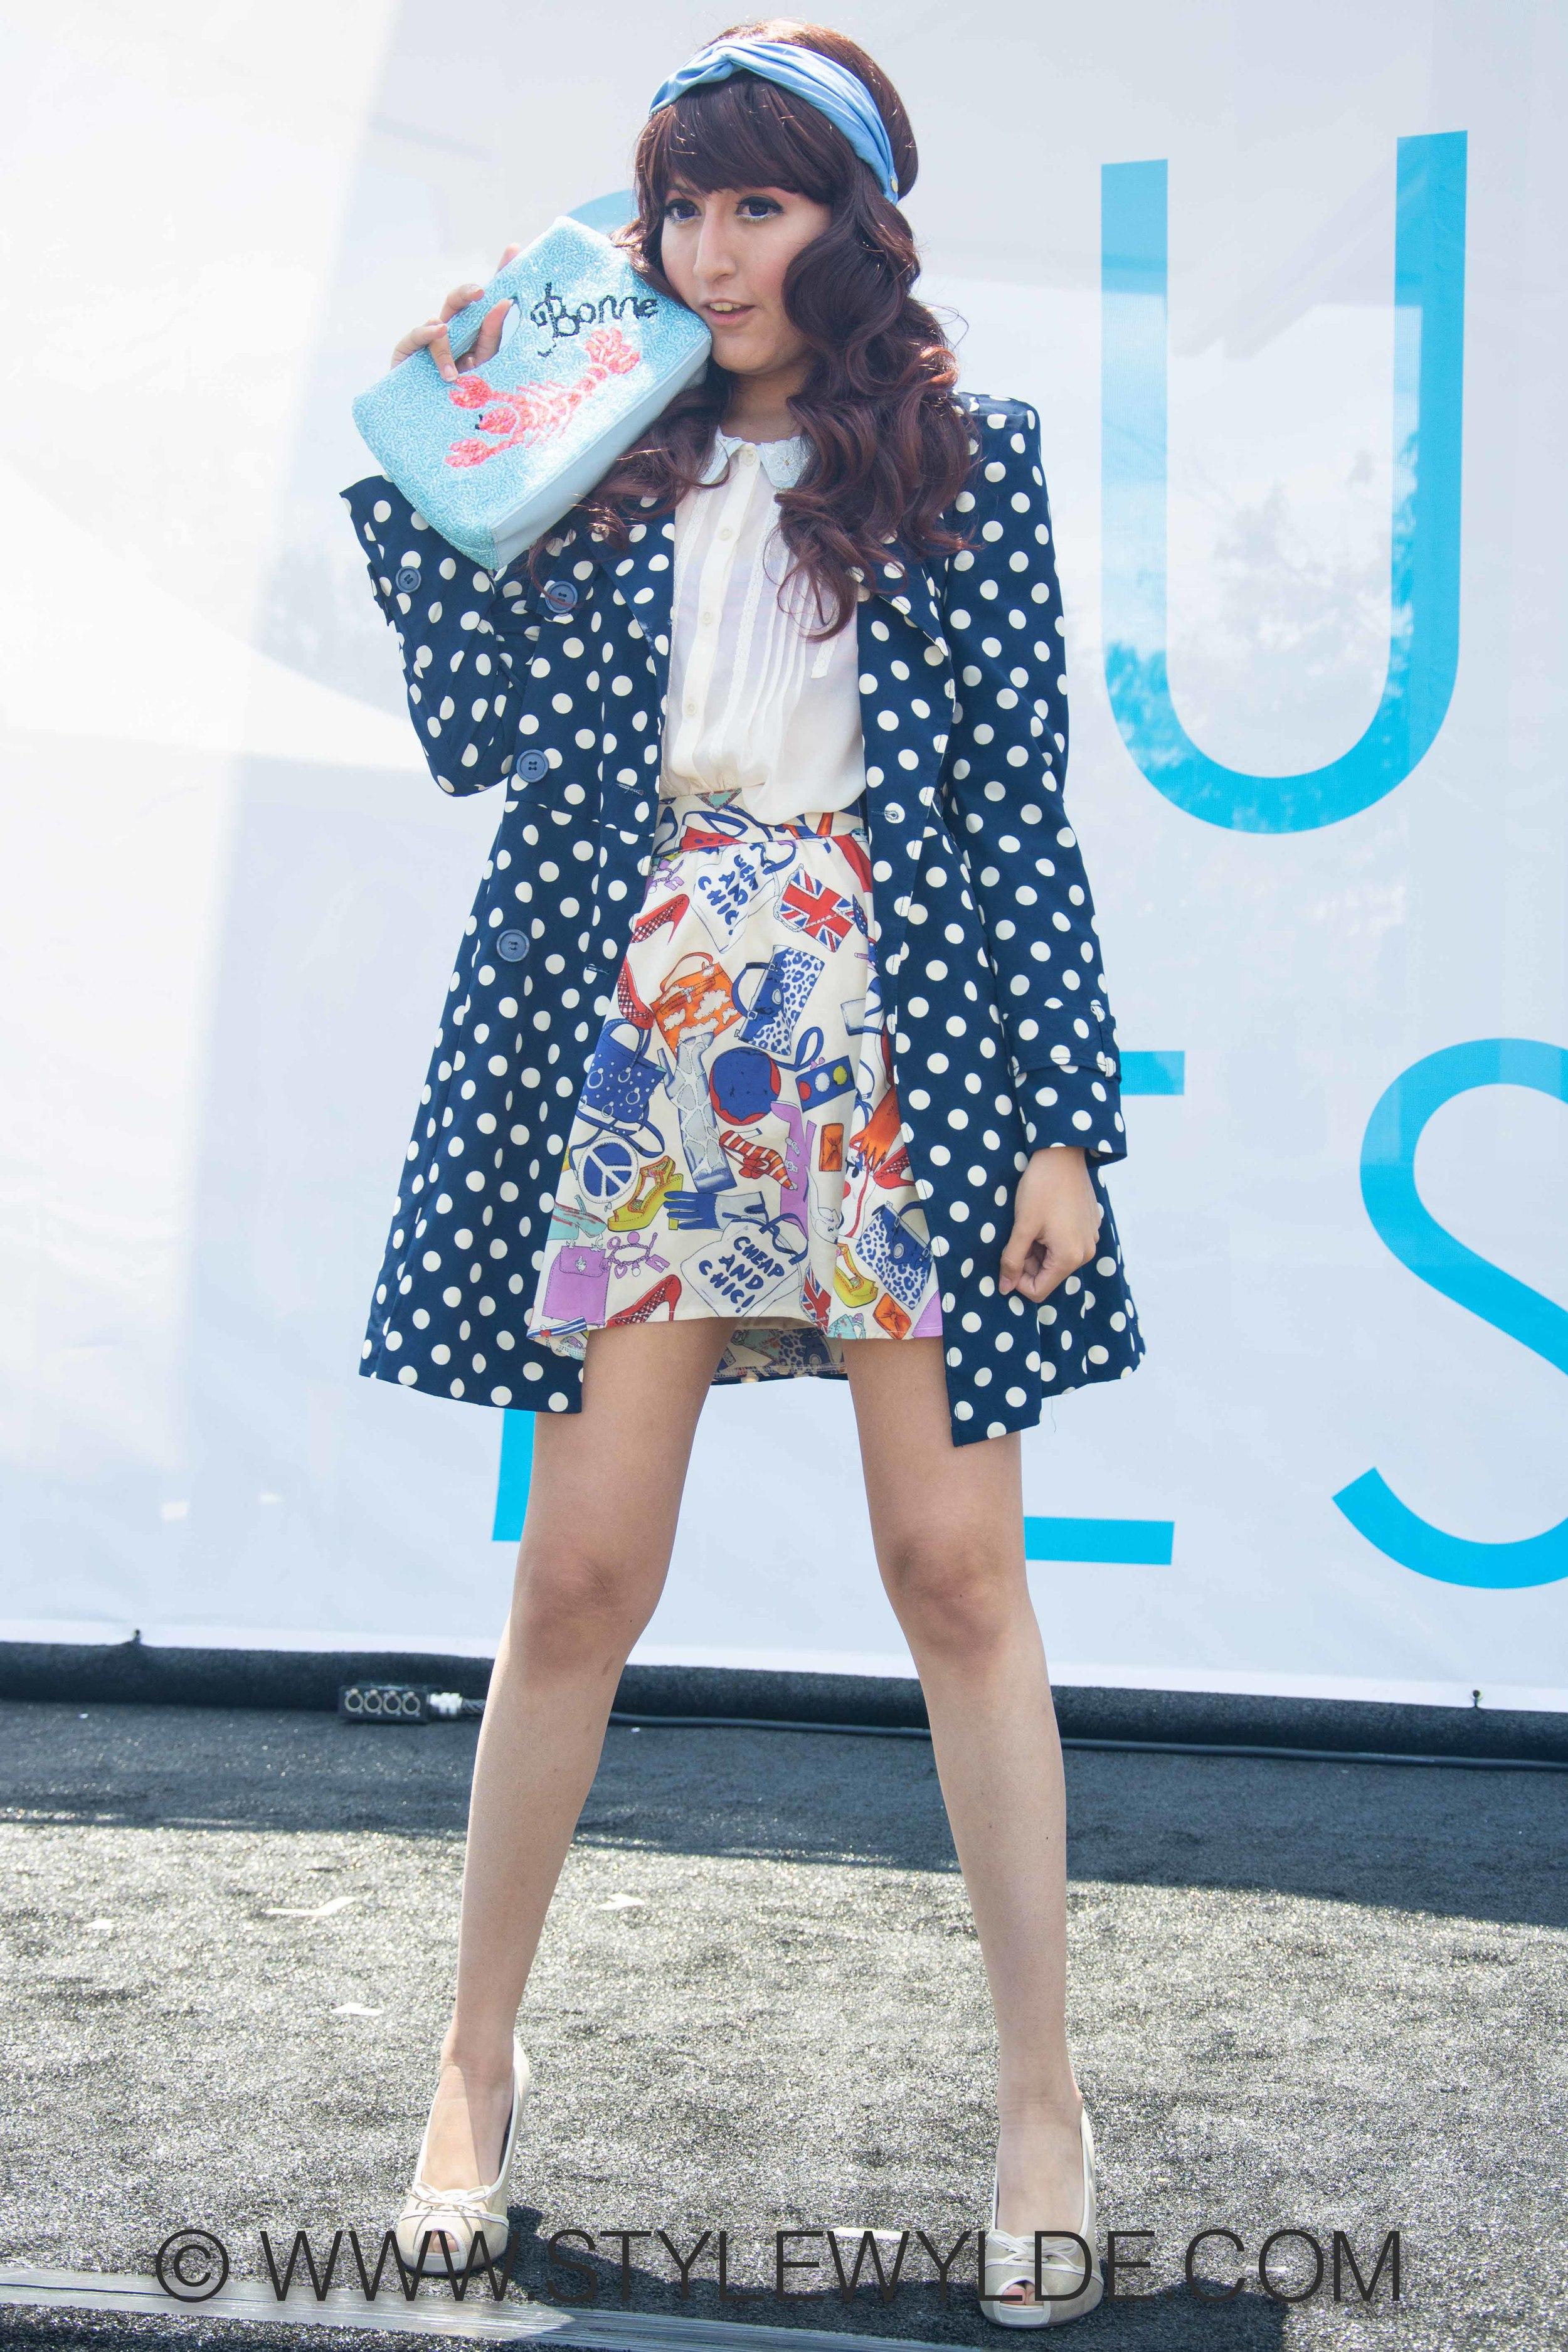 stylewylde_sw_jpop_2014_fashion_show-3.jpg